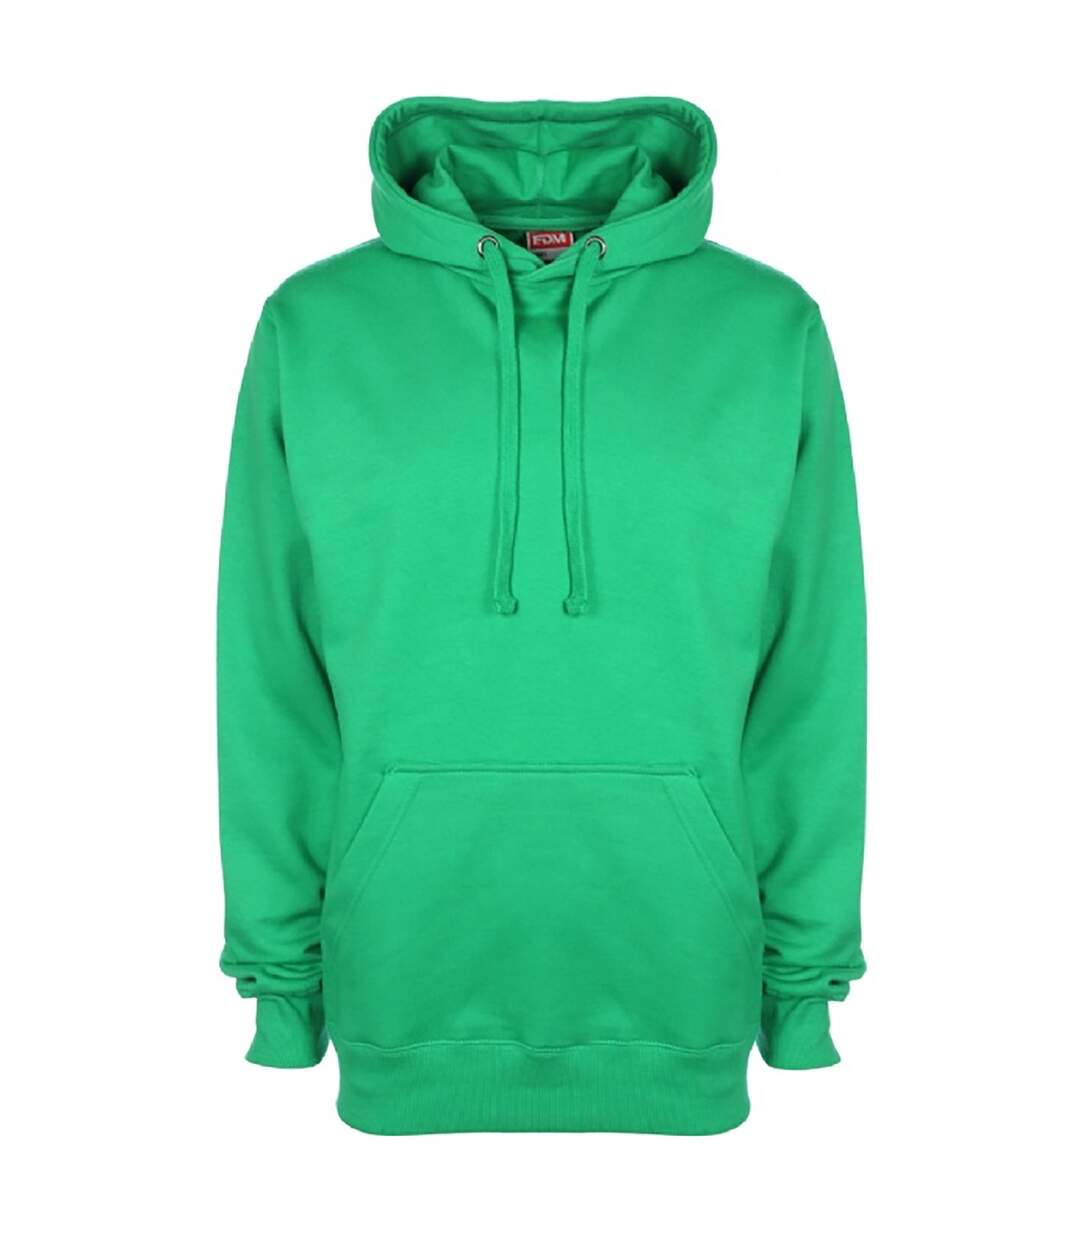 FDM Unisex Plain Original Hooded Sweatshirt / Hoodie (300 GSM) (Tangerine) - UTBC2024